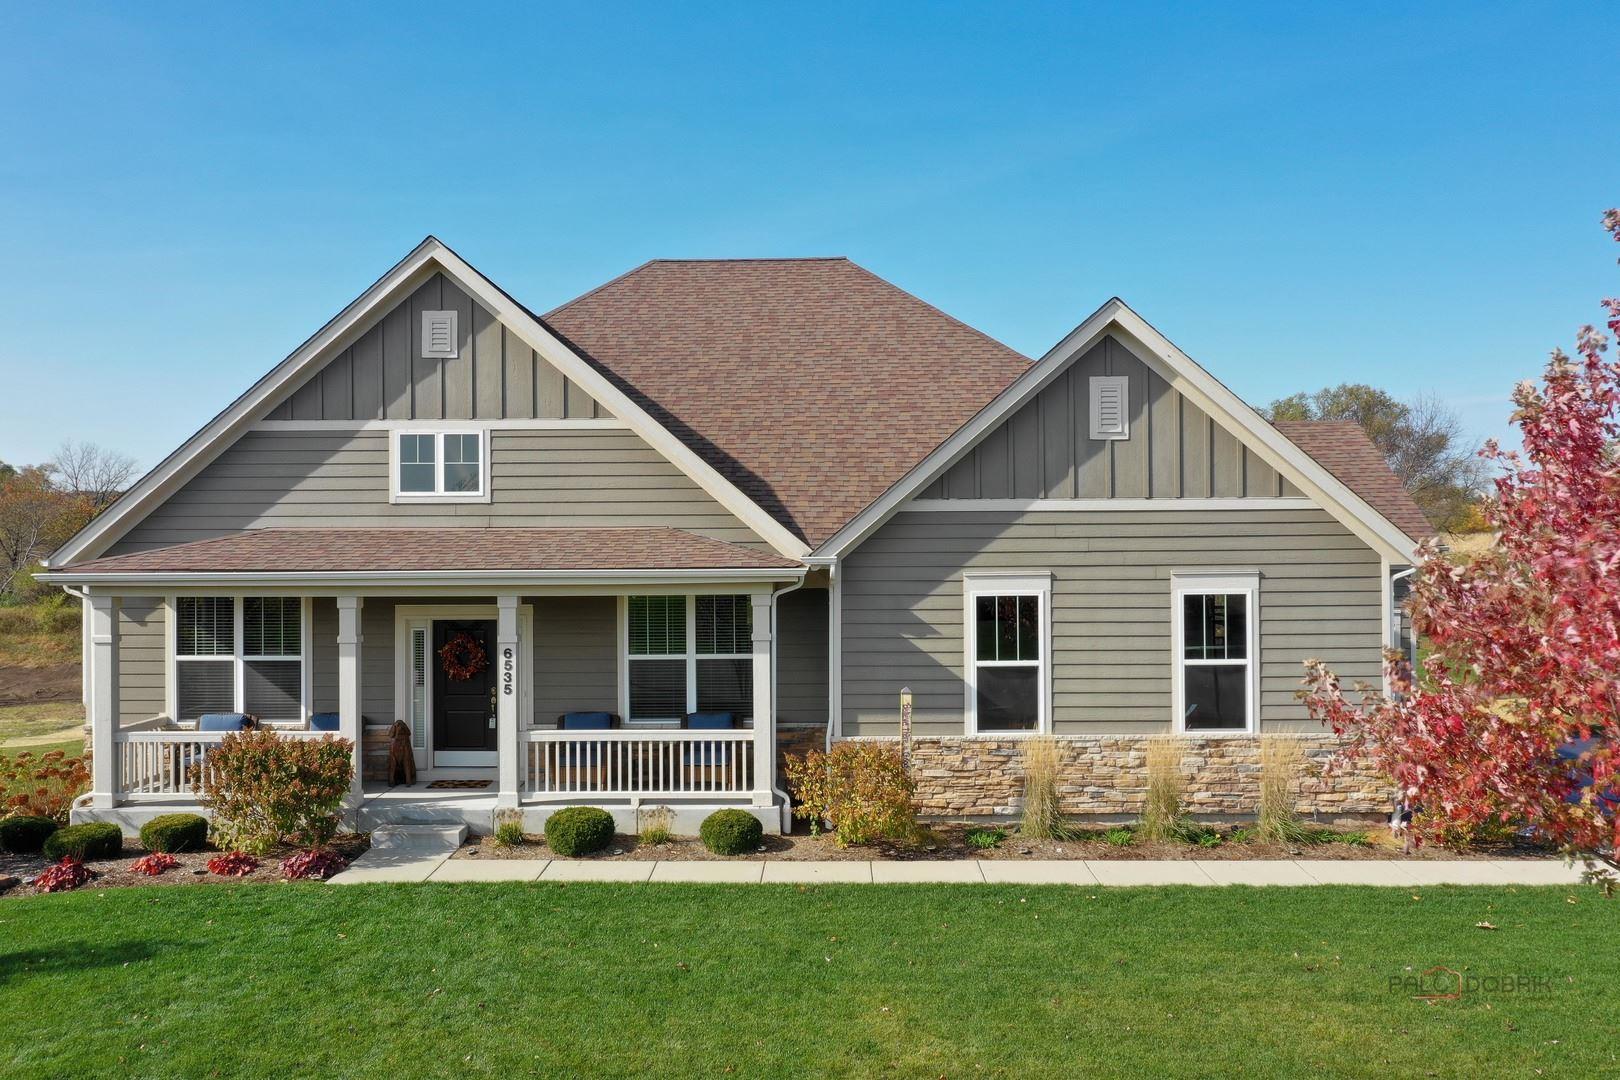 6535 Woodland Hills Drive, Lakewood, IL 60014 - #: 10912396